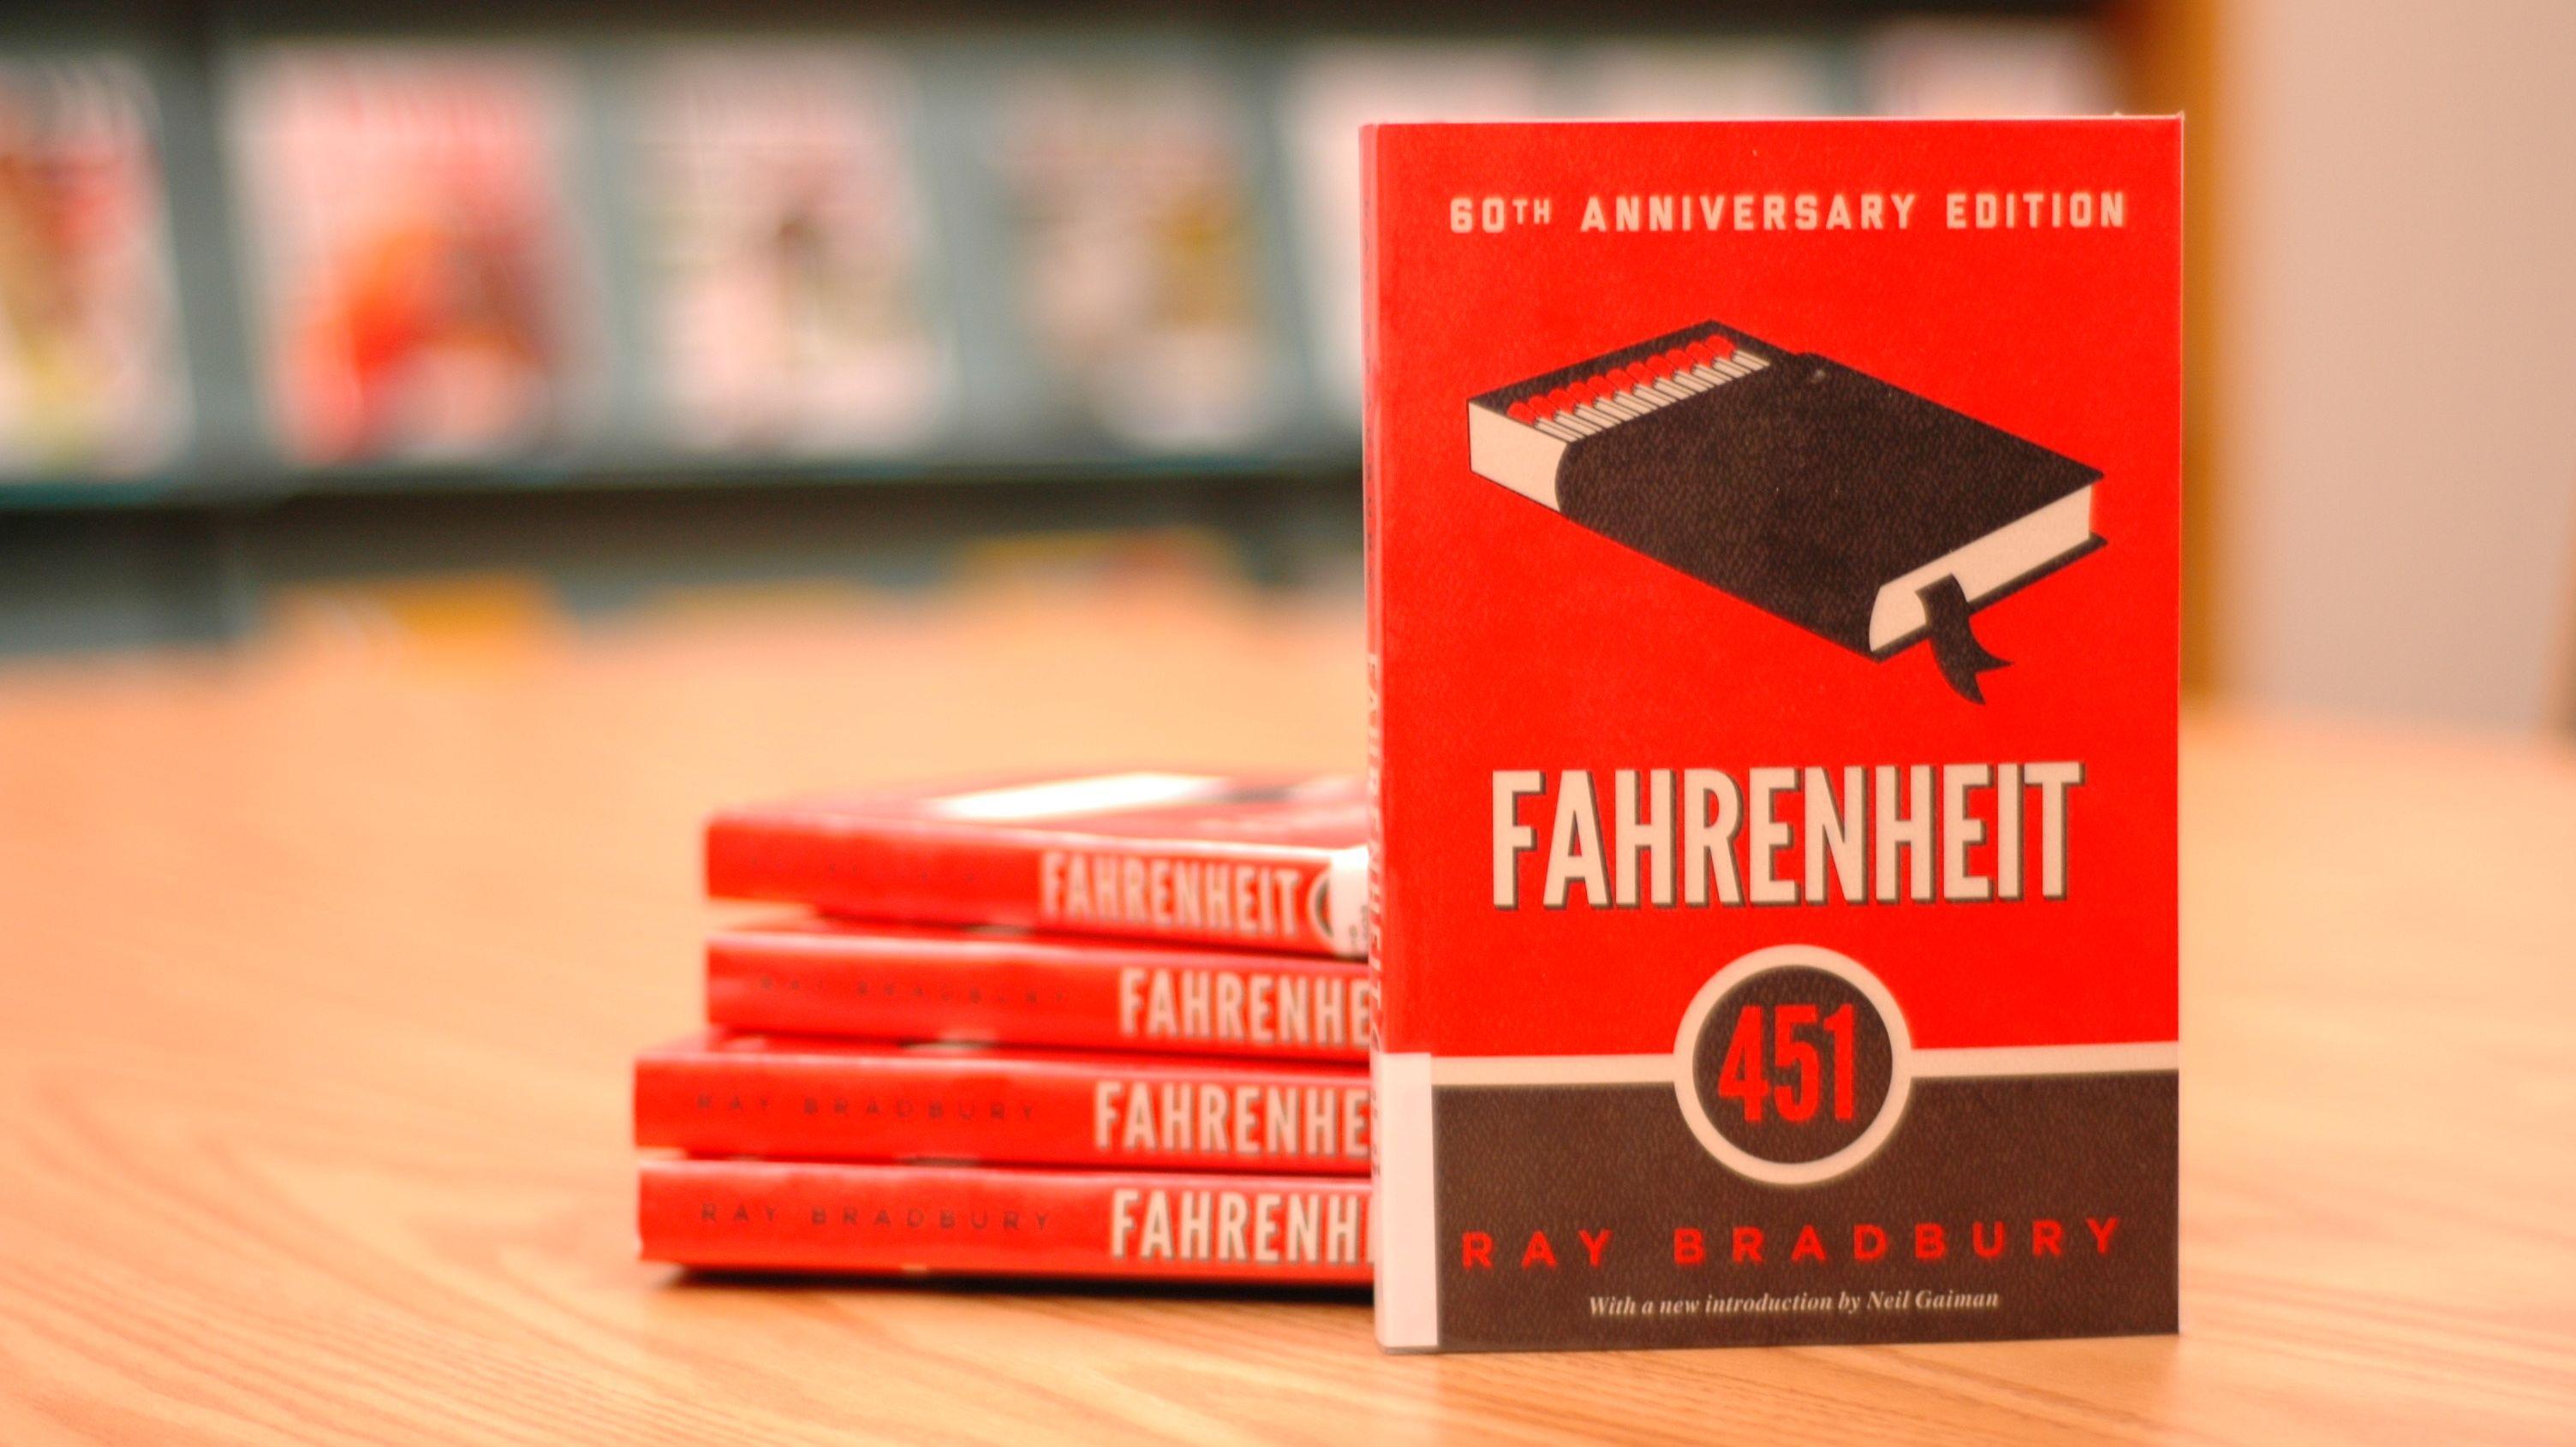 16 Surprising Facts About Ray Bradbury's Fahrenheit 451